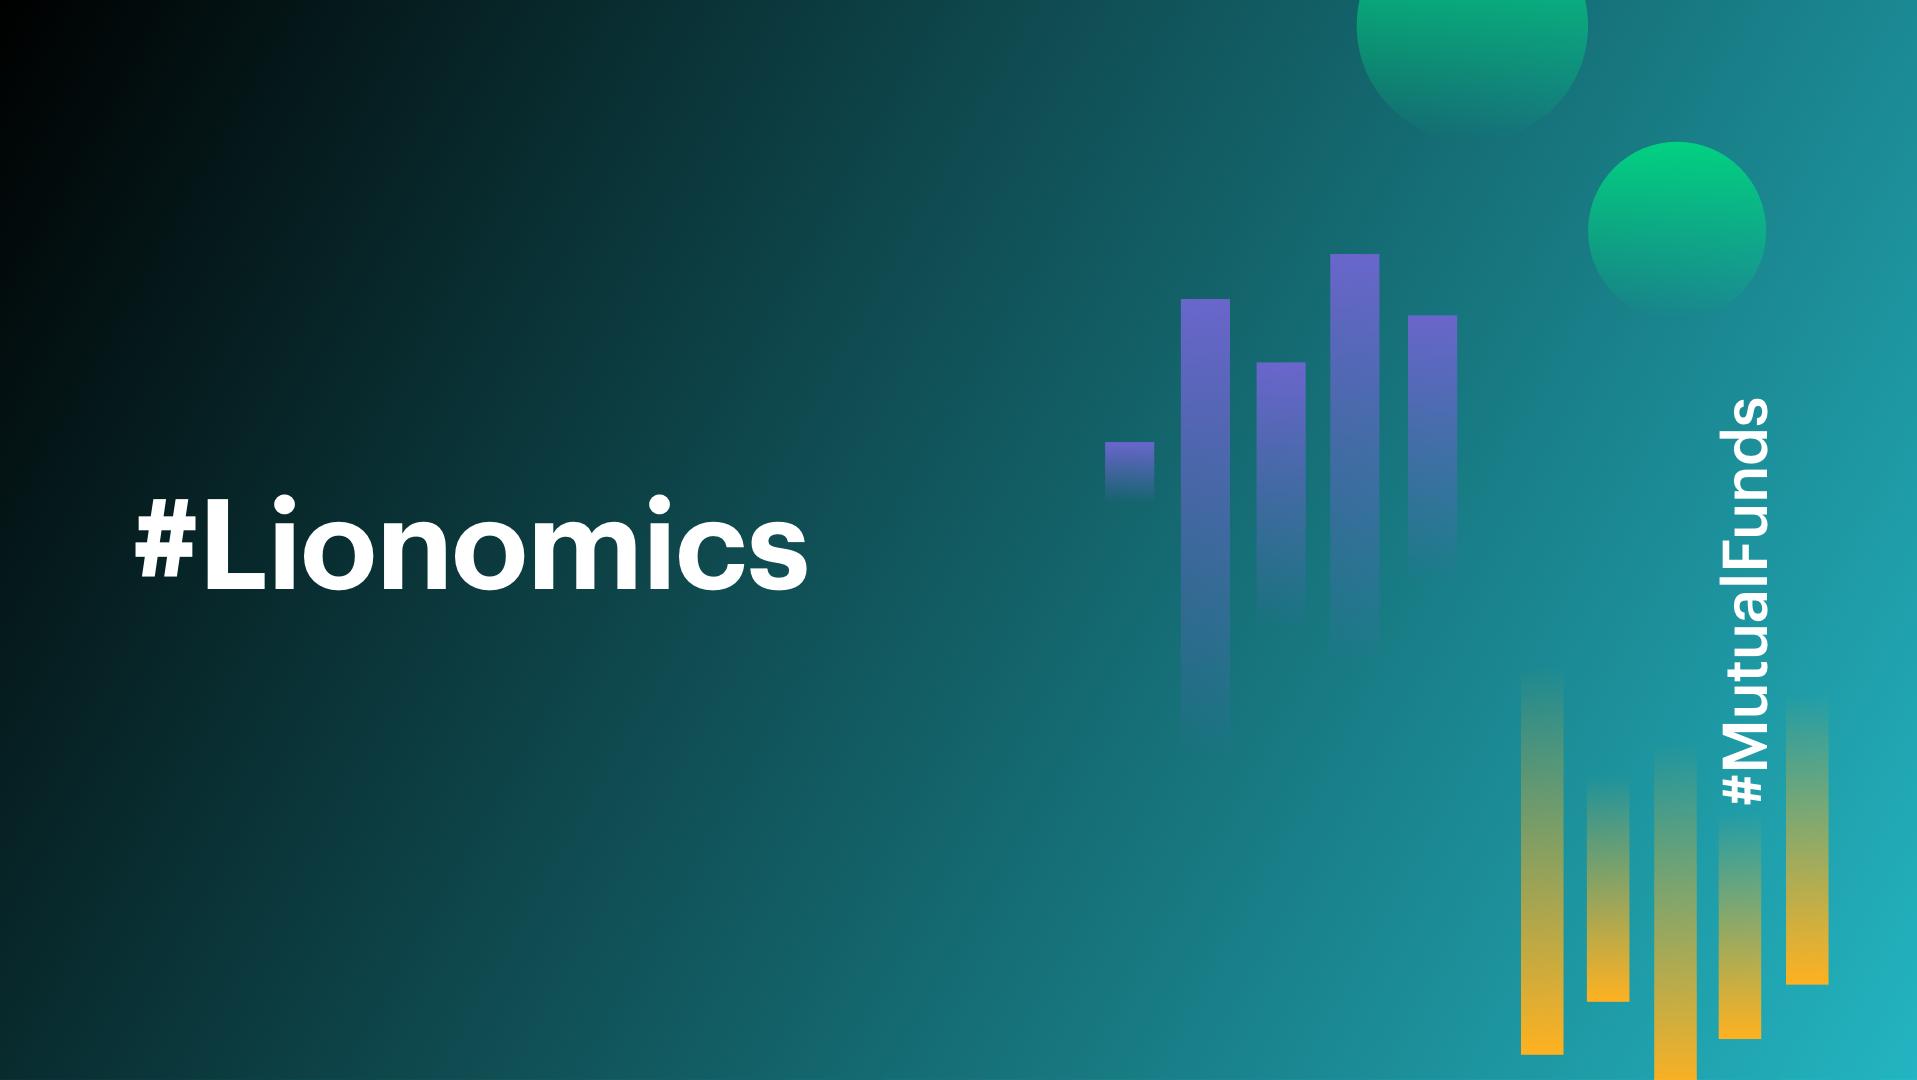 Lionomics 14 Blog Mutual Funds 08212018